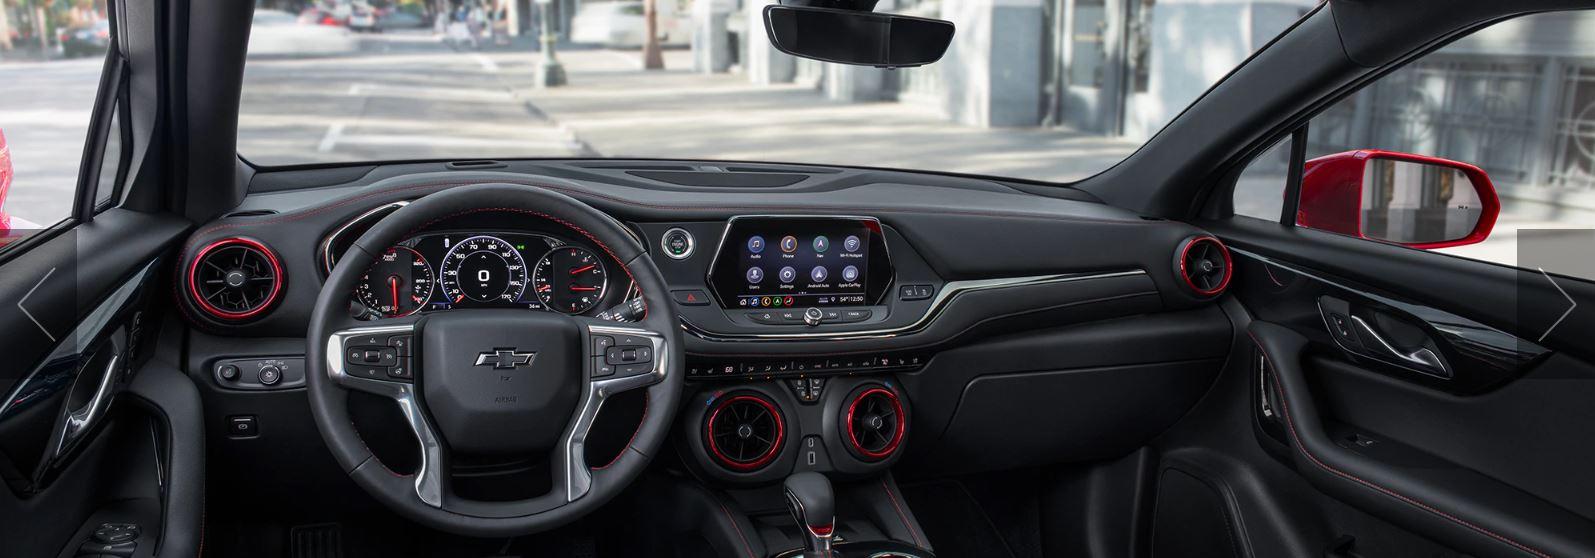 Interior of the 2020 Chevrolet Blazer